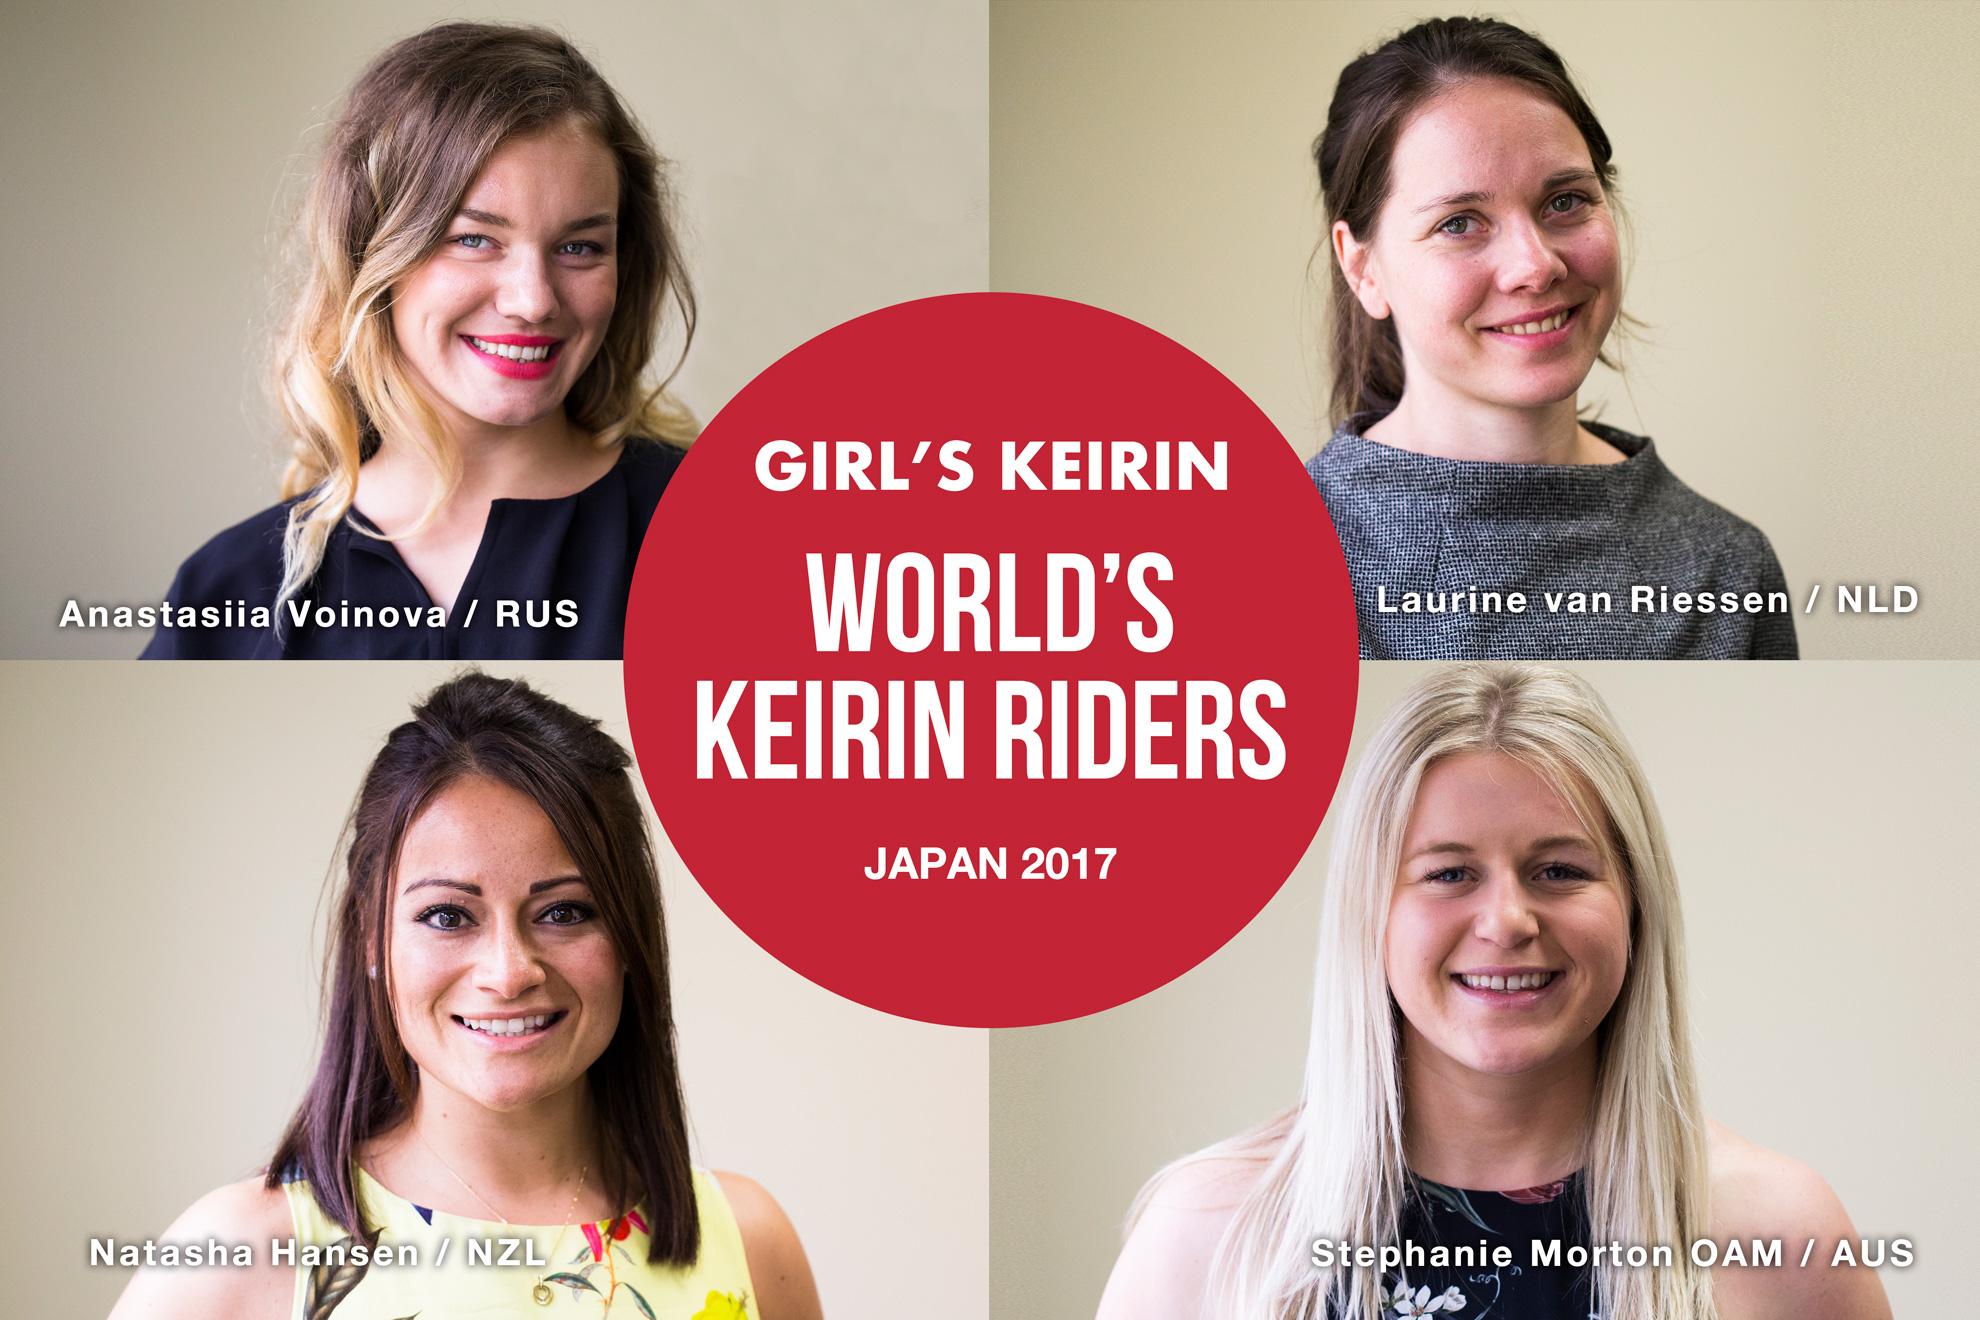 The World's KEIRIN Riders